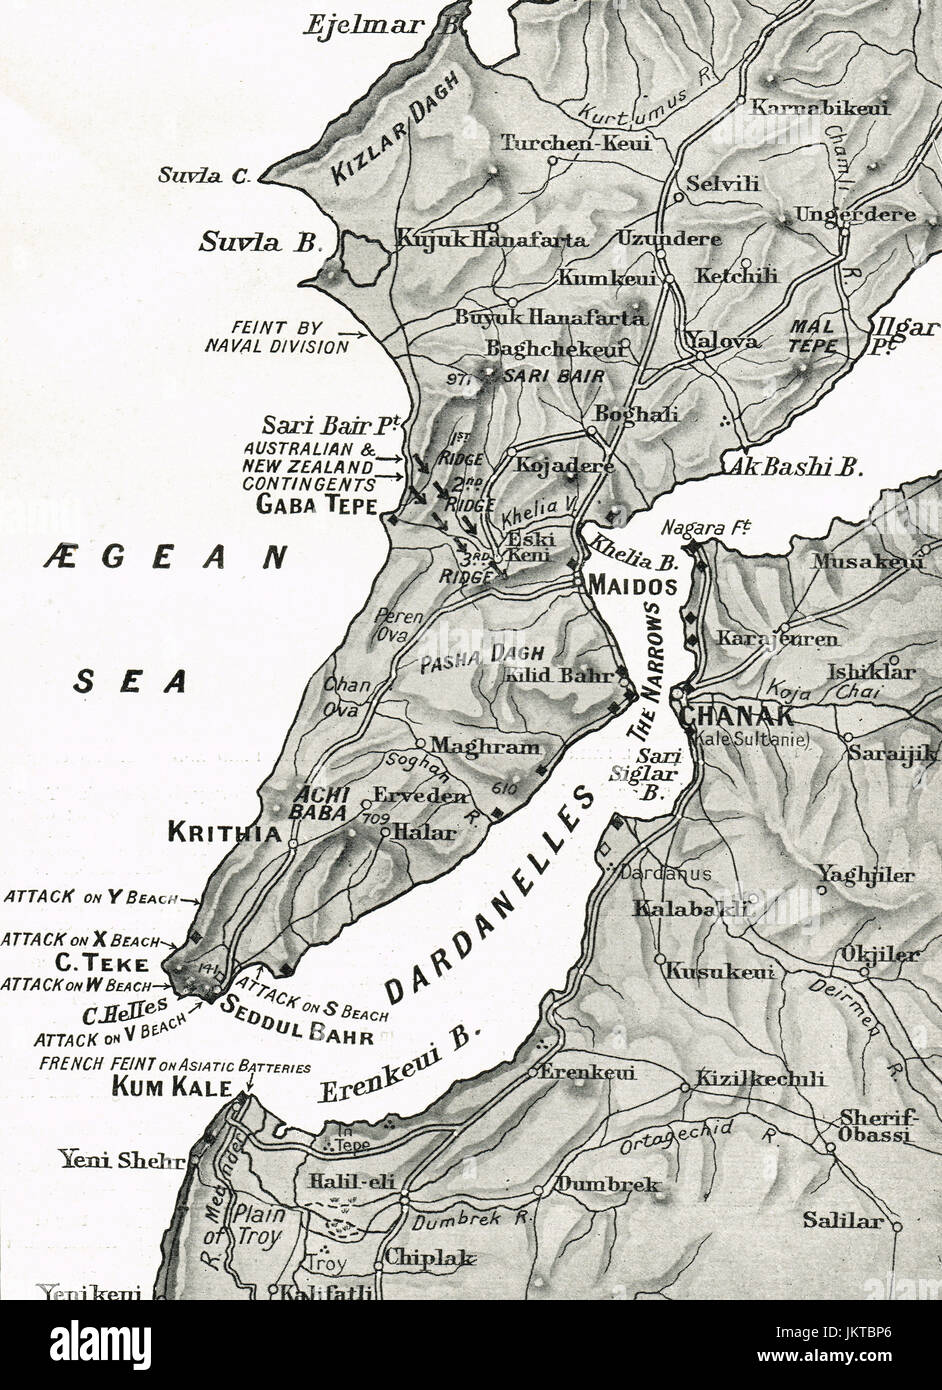 Map of Dardanelles & Gallipoli peninsula, Dardanelles campaign, 1915 Dardanelles Map on